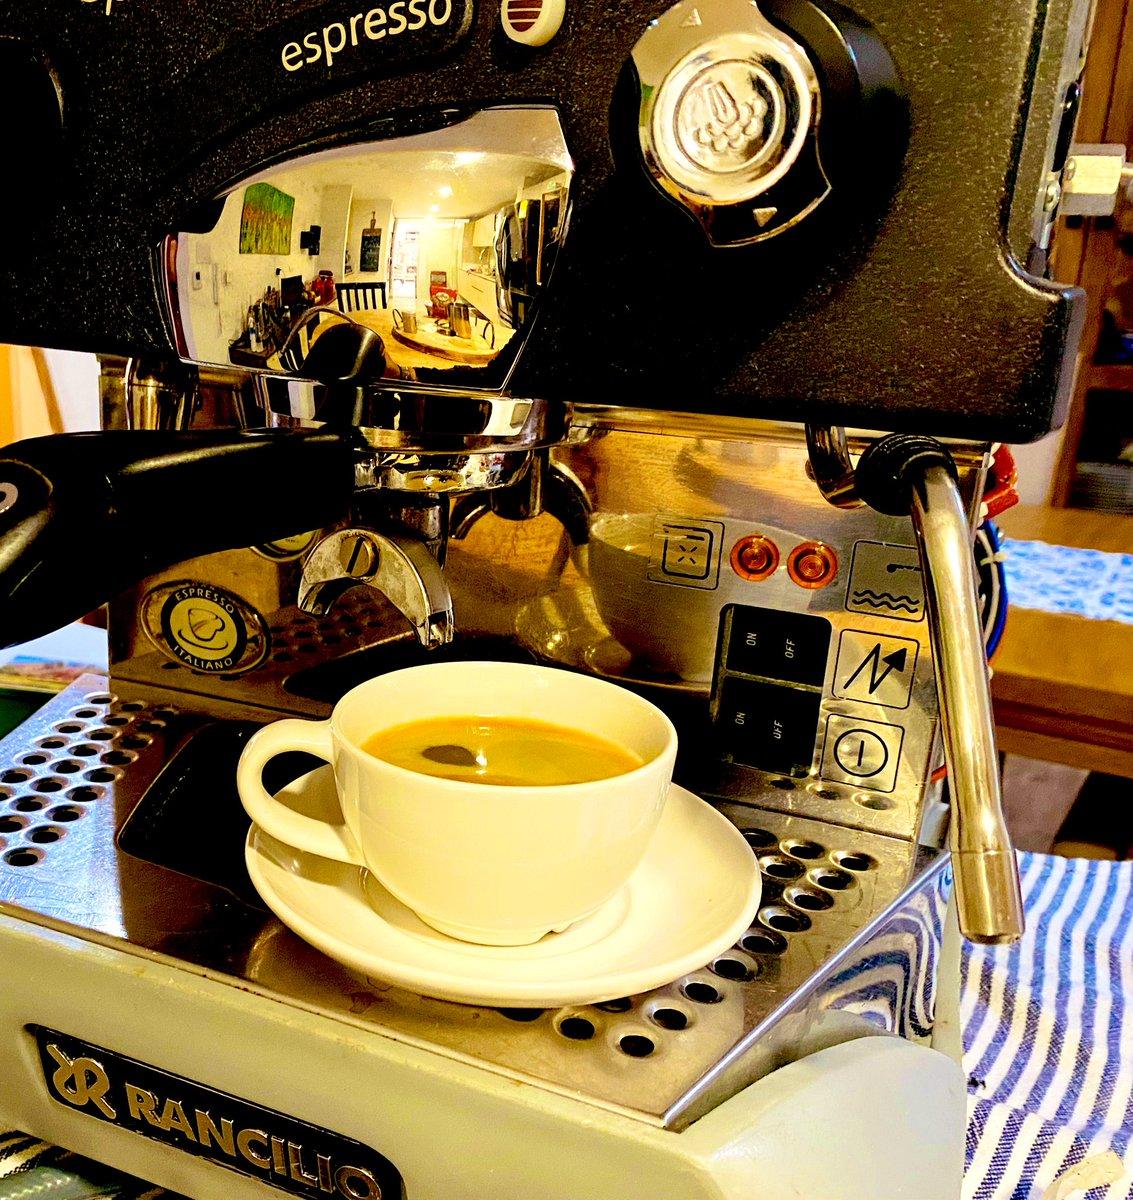 Un #americano hecho con un Café de Pueblo....  #cafedeantioquia  Una delicia🙏  #cafe #cafeamericano #cafedecolombia #cafesdeespecialidad #cafesespeciales #momentosdecafe #pasionporelcafe   @villegascafe https://t.co/D9Cild7l0k